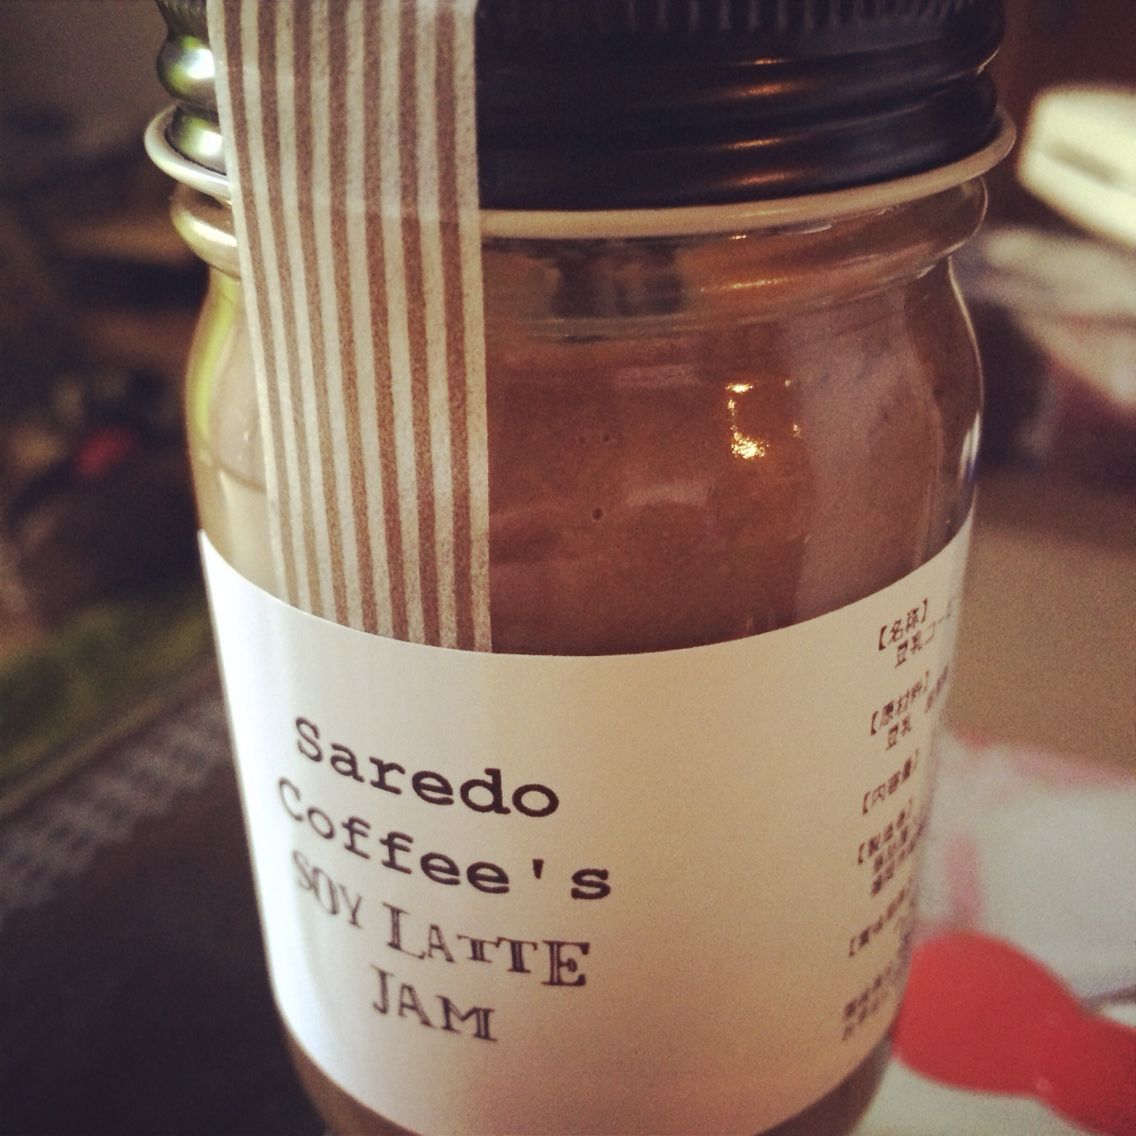 Soy latte coffee Jam @saredocoffee